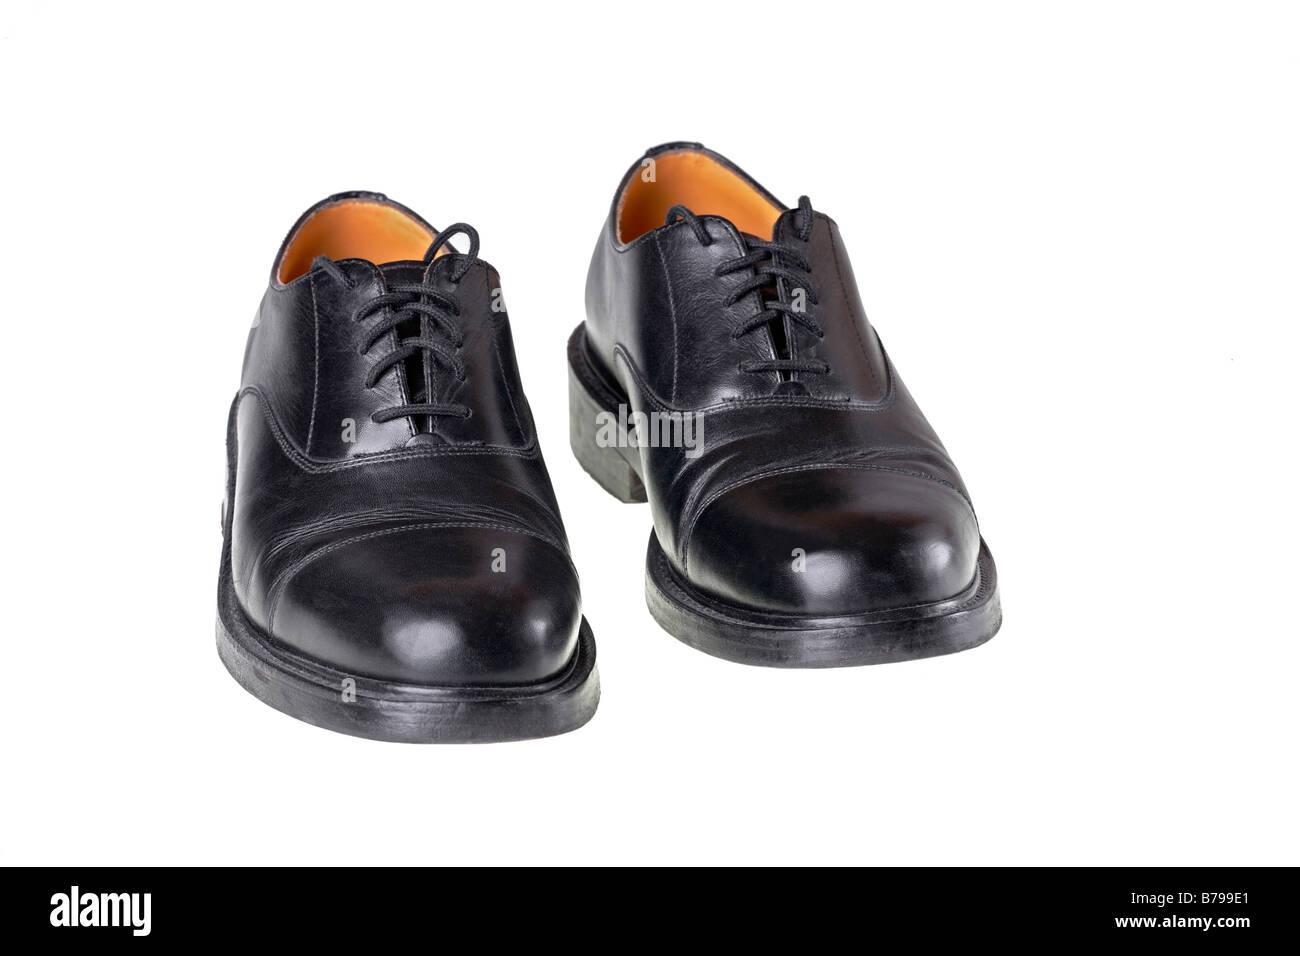 separation shoes d8758 dc9ba ein paar schwarze Leder Herren Schuhe Stockfoto, Bild ...